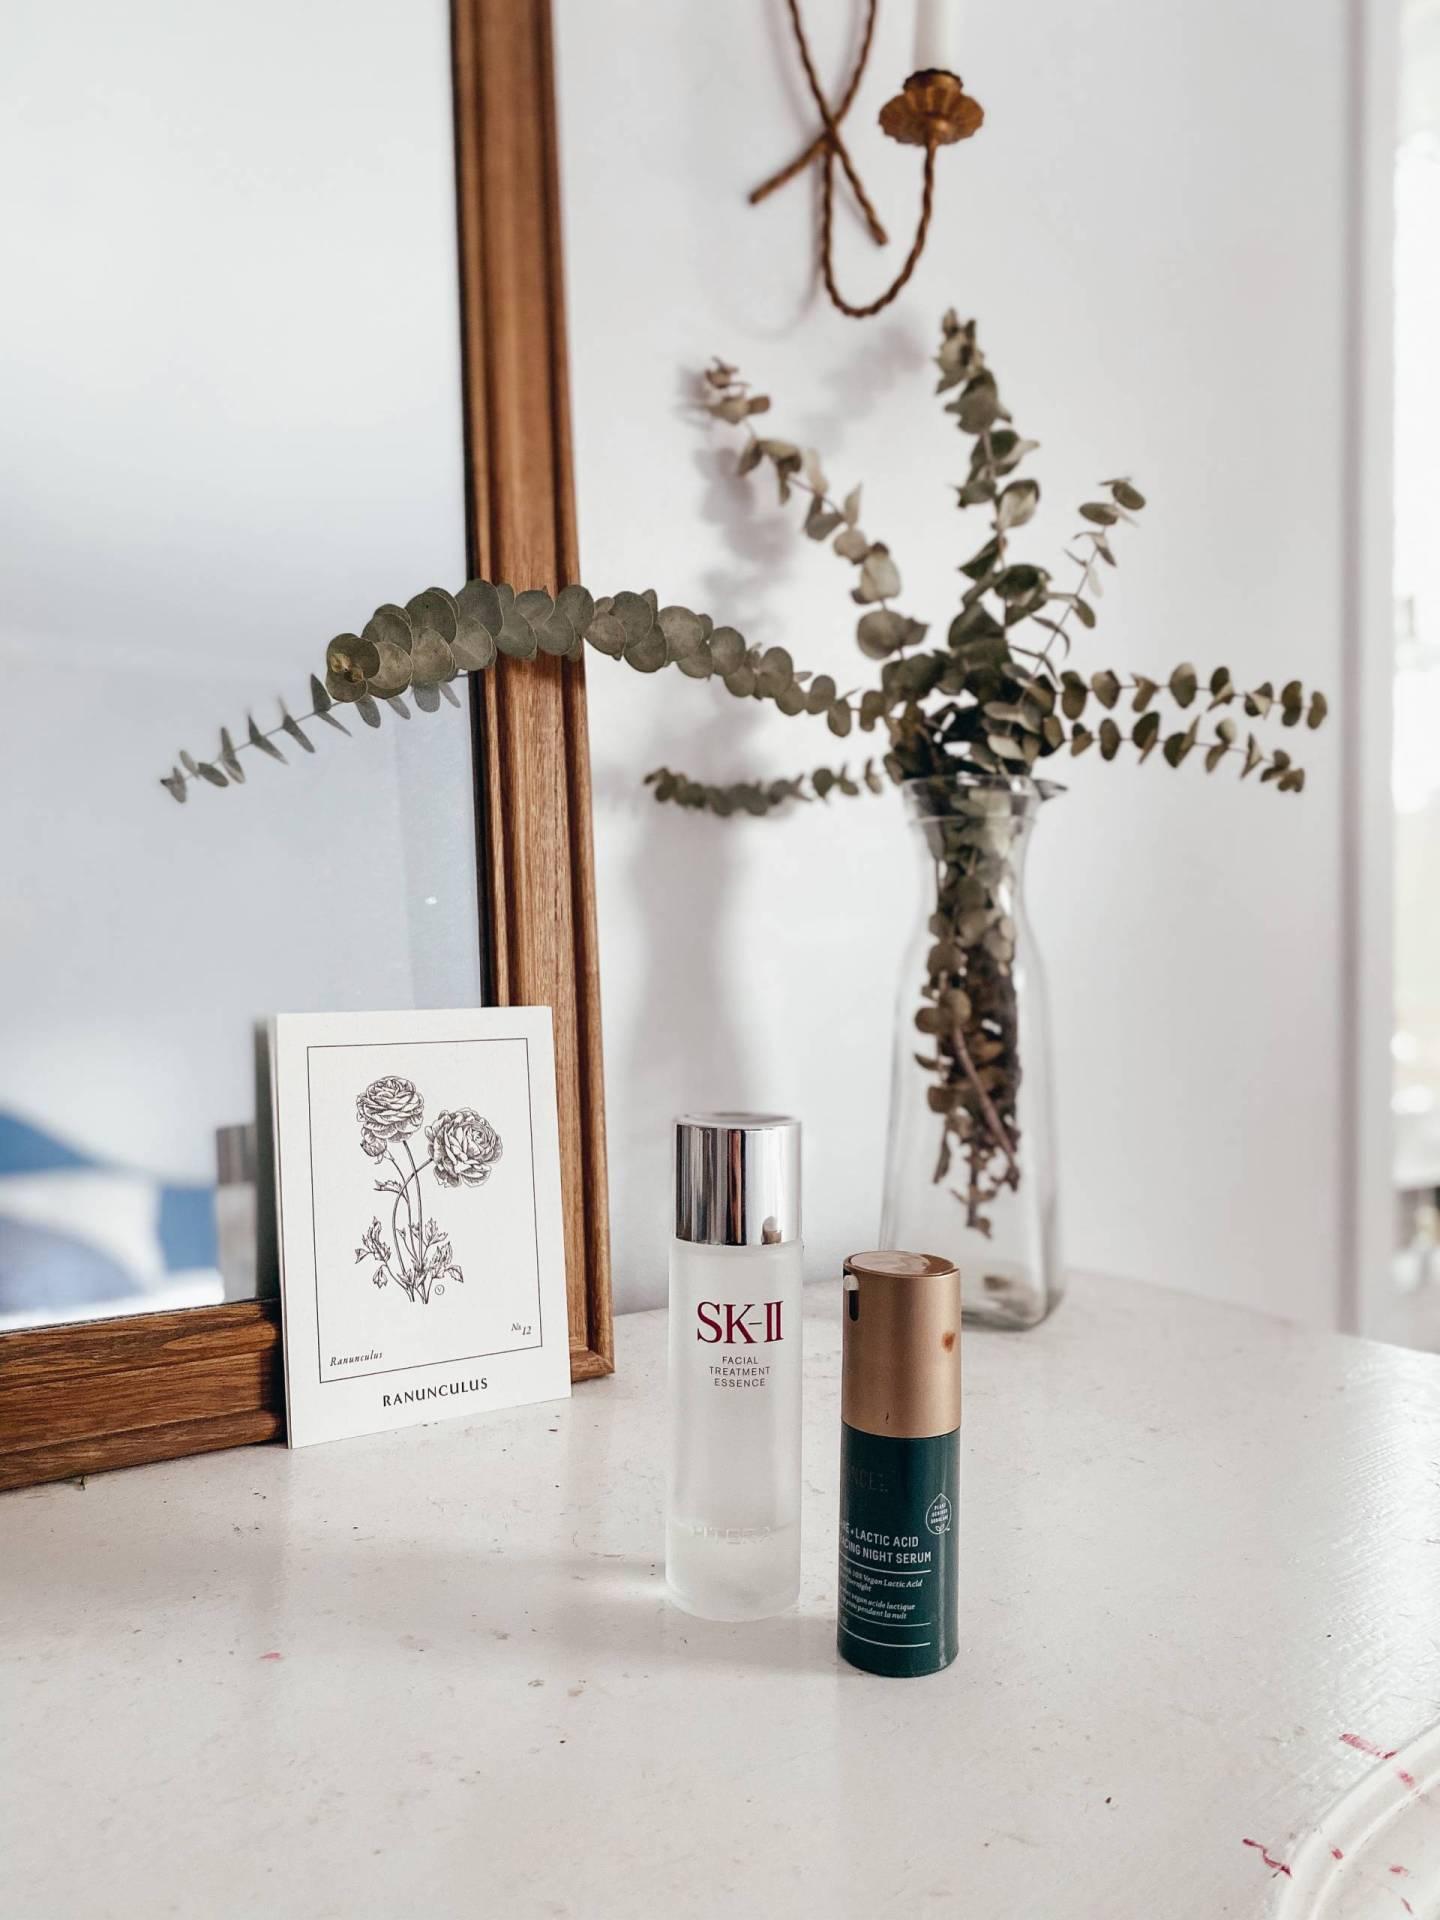 SK-II Facial Treatment Essence Review, Biossance Squalane + Lactic Acid Resurfacing Night Serum Review